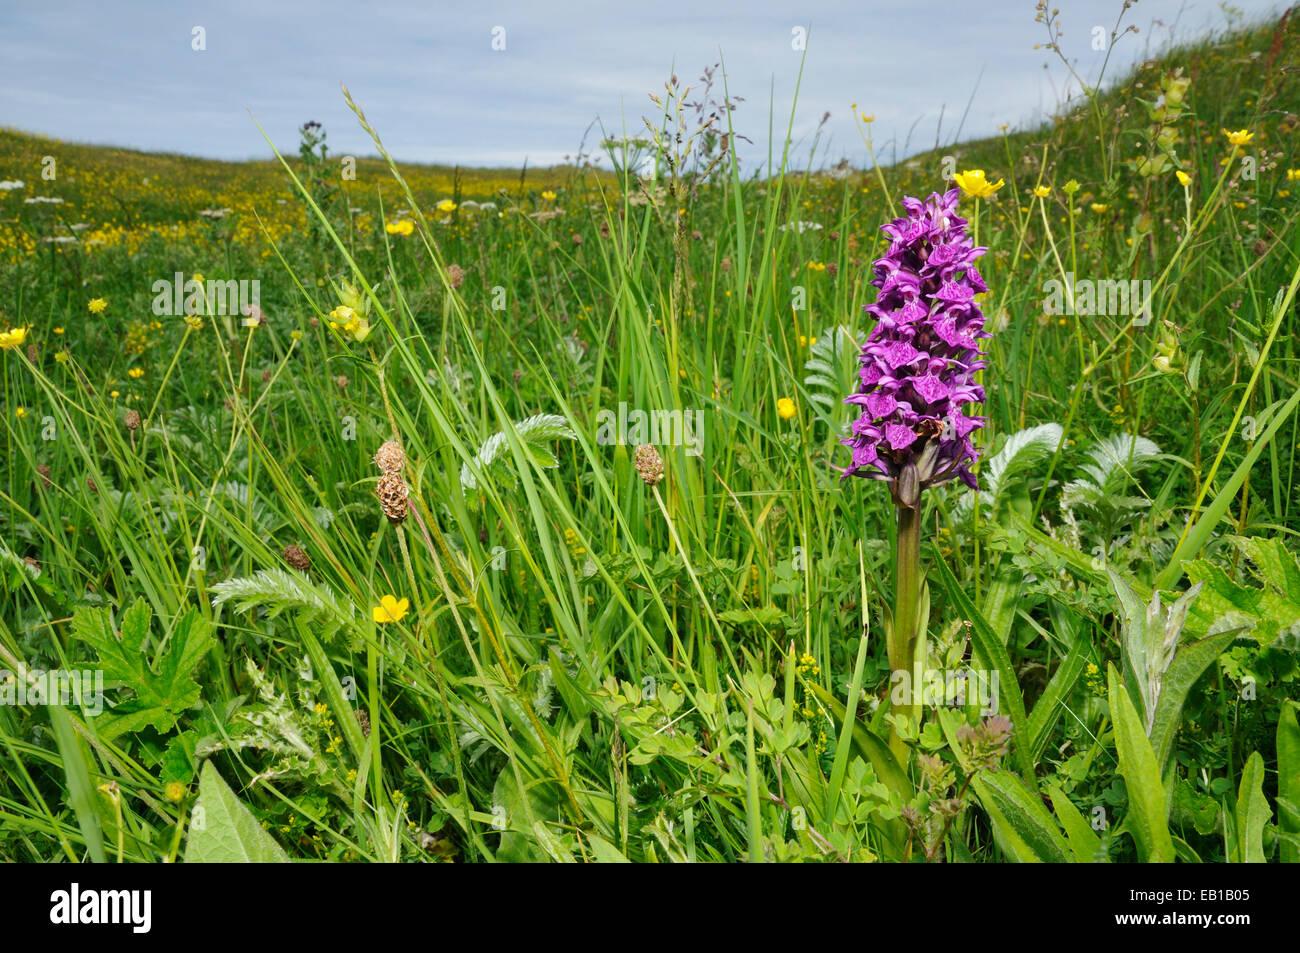 Northern Marsh Orchid - Dactylorhiza purpurella  Growing on Machair grassland - Stock Image